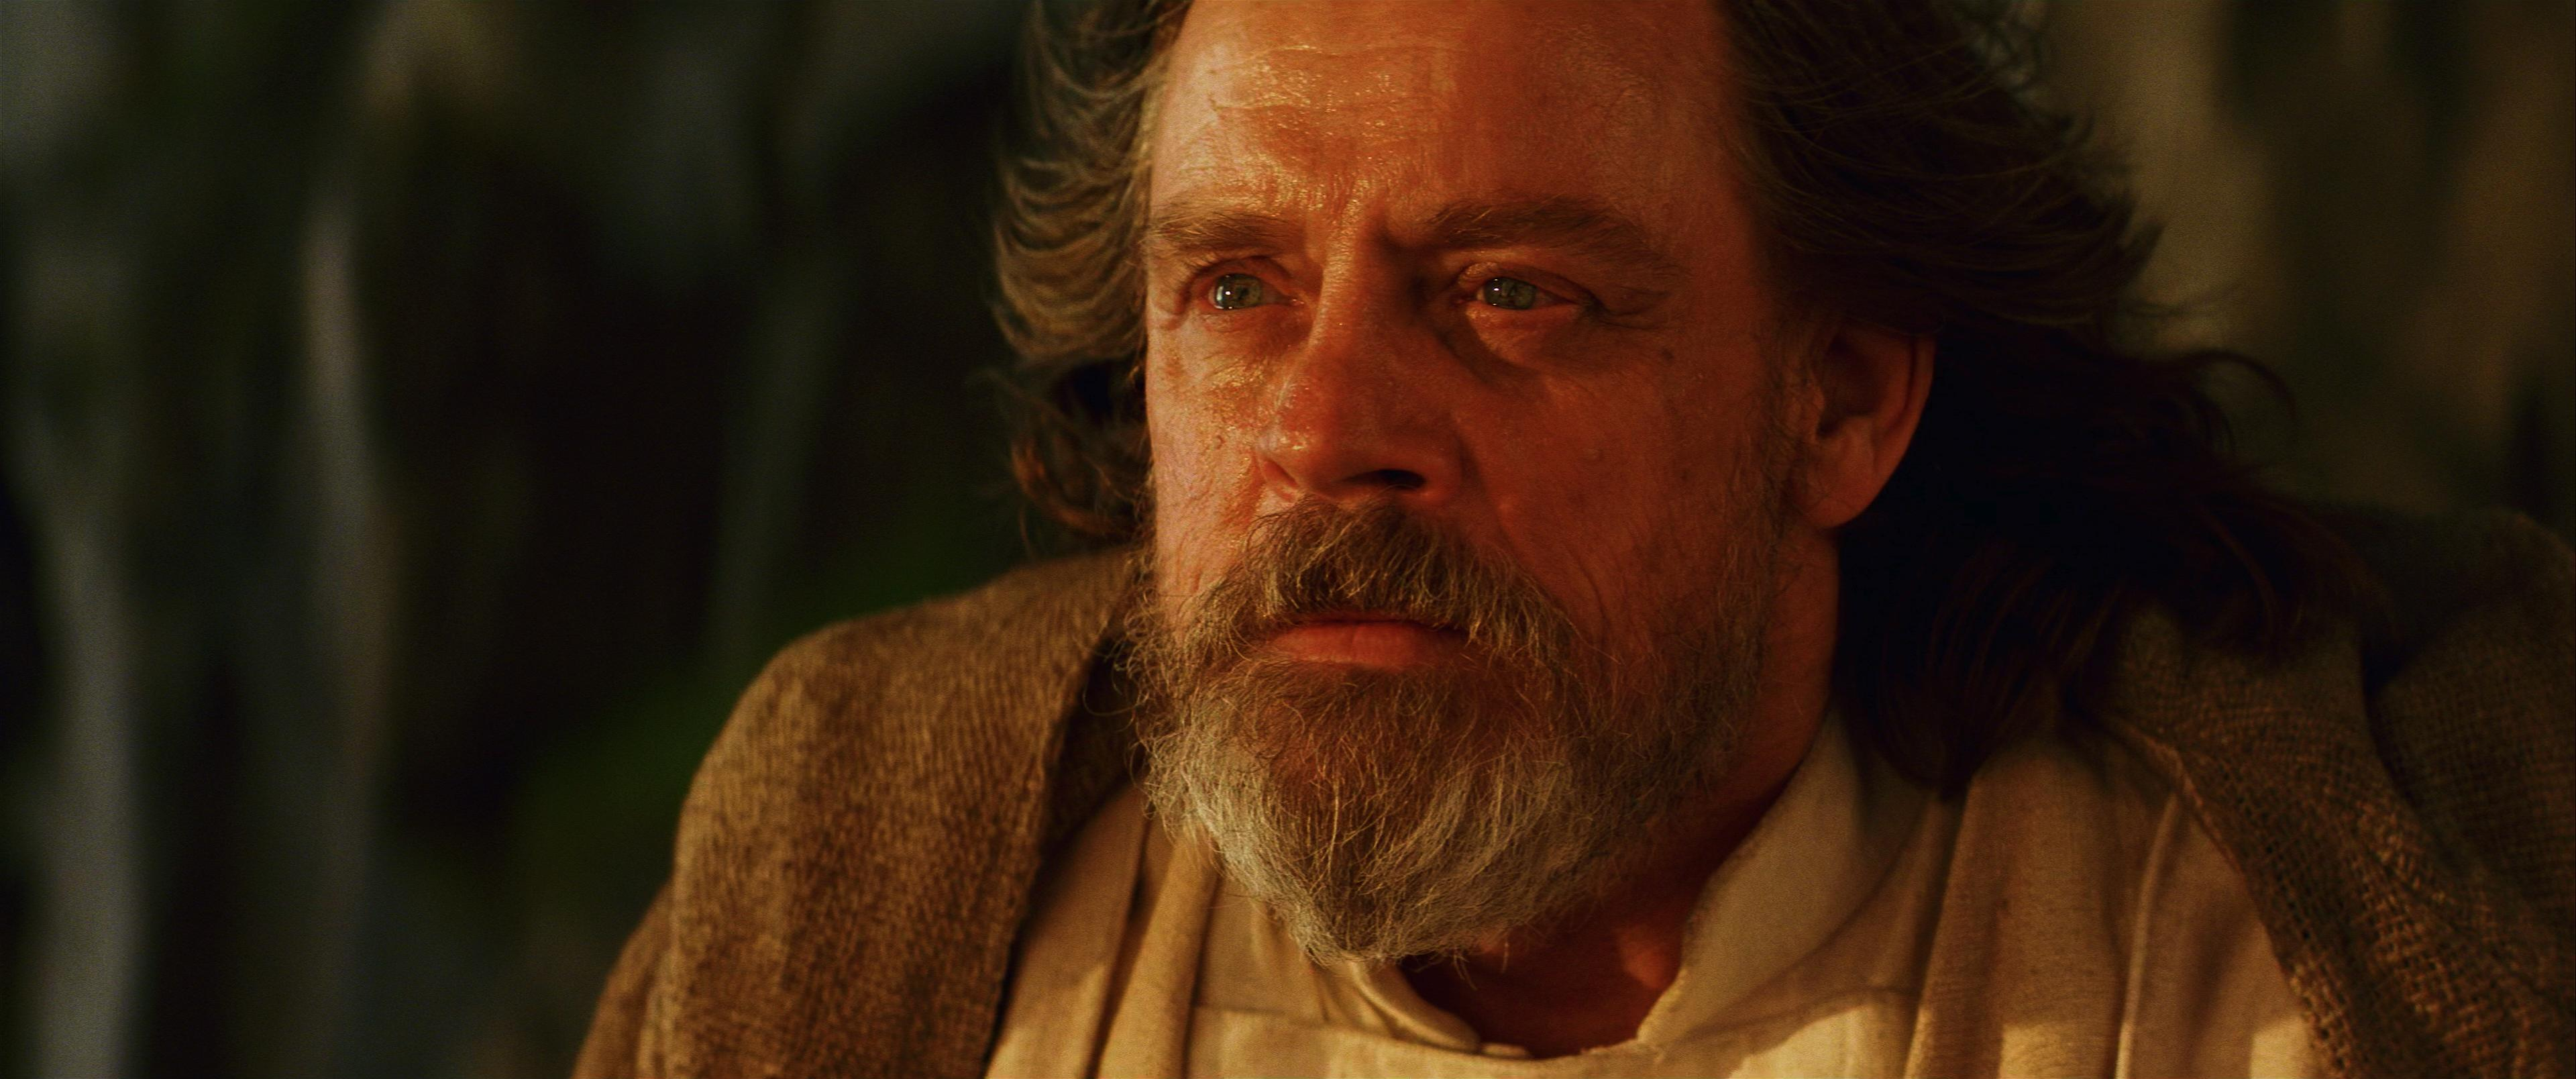 old luke skywalker in close up with tears in his eyes